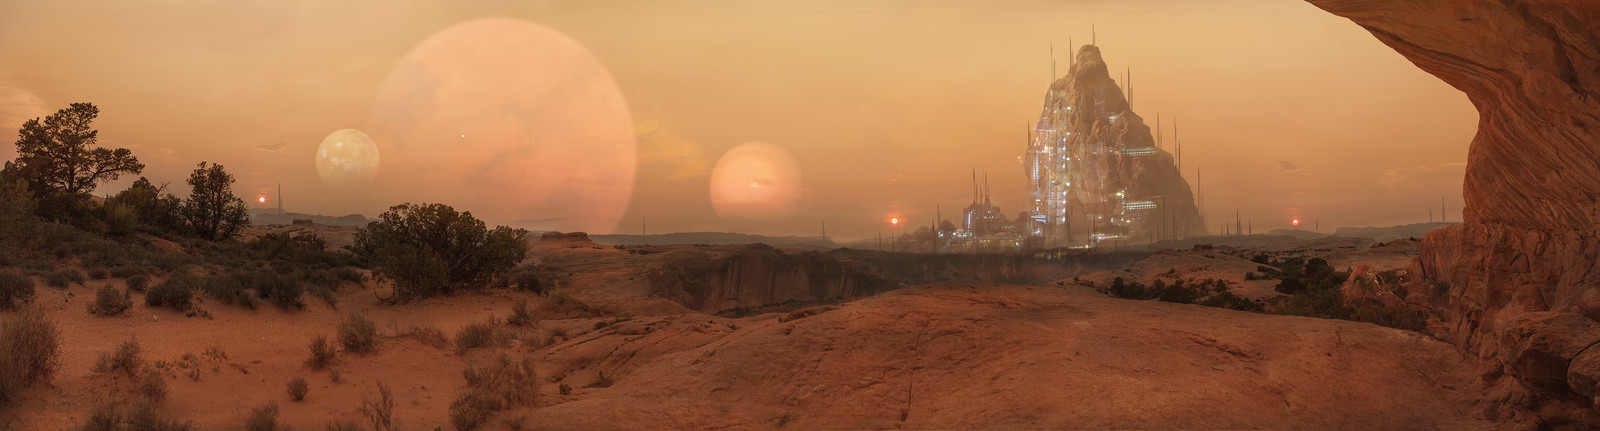 Tatooine - WIP